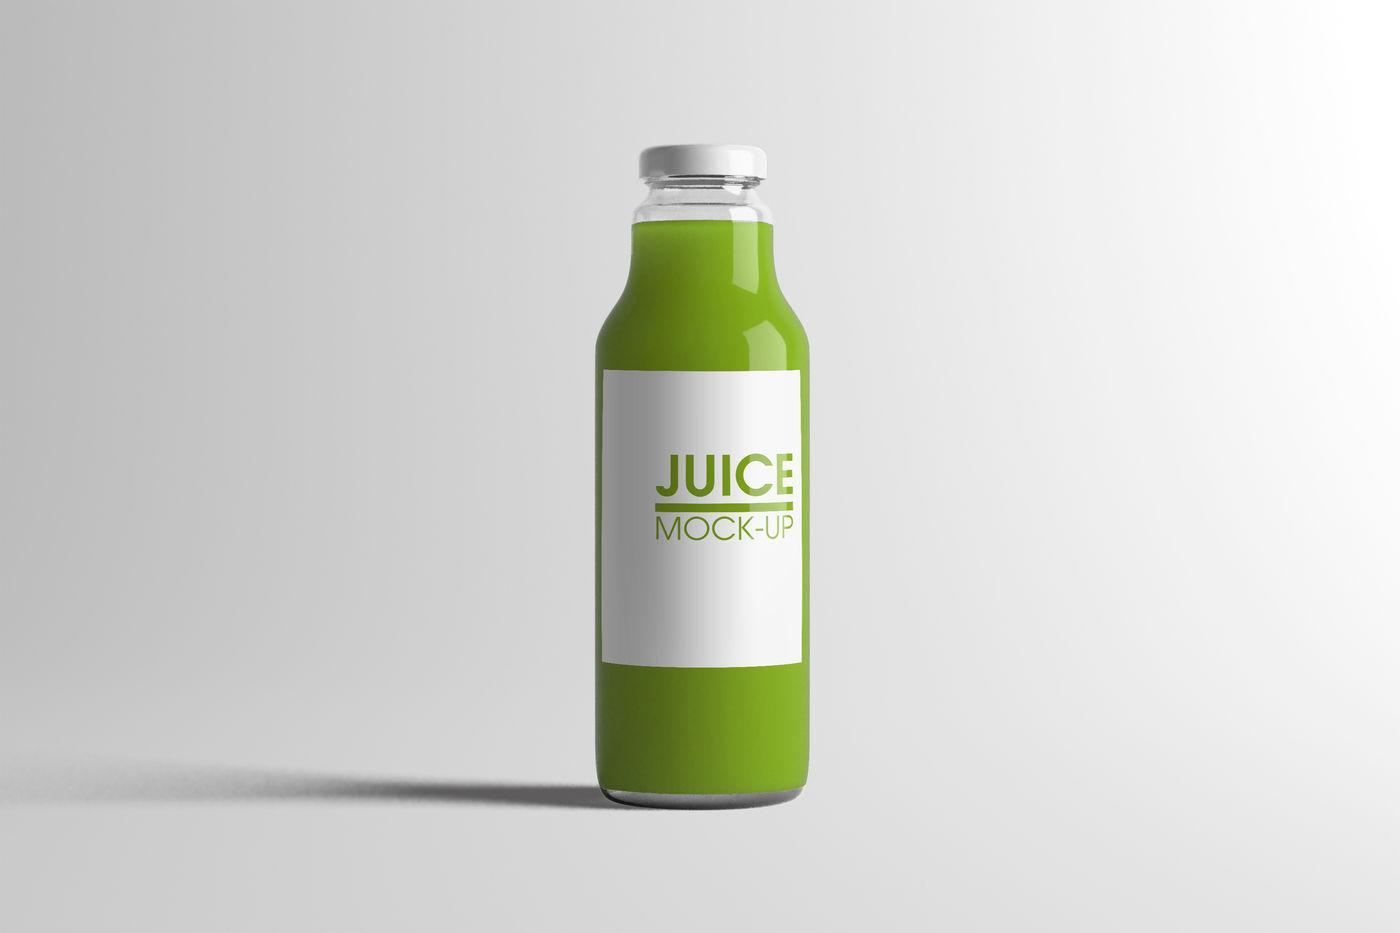 Download Juice Packaging Mockup Free Yellowimages